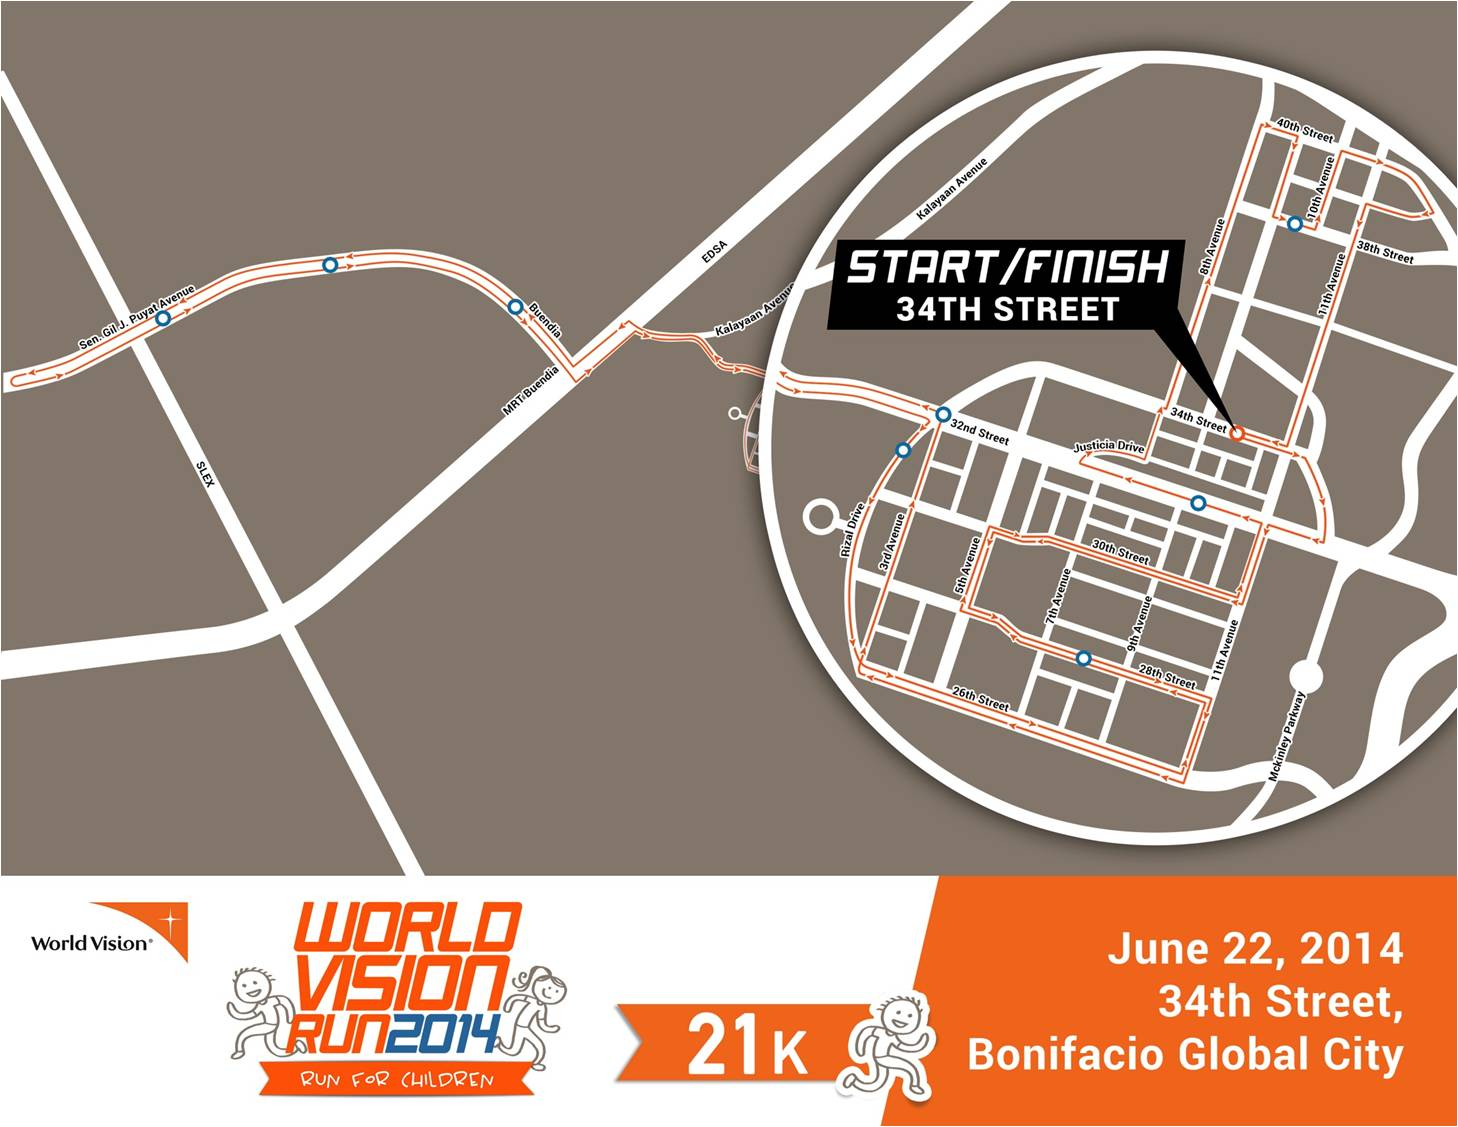 World-Vision-Run-Race-Route-21k